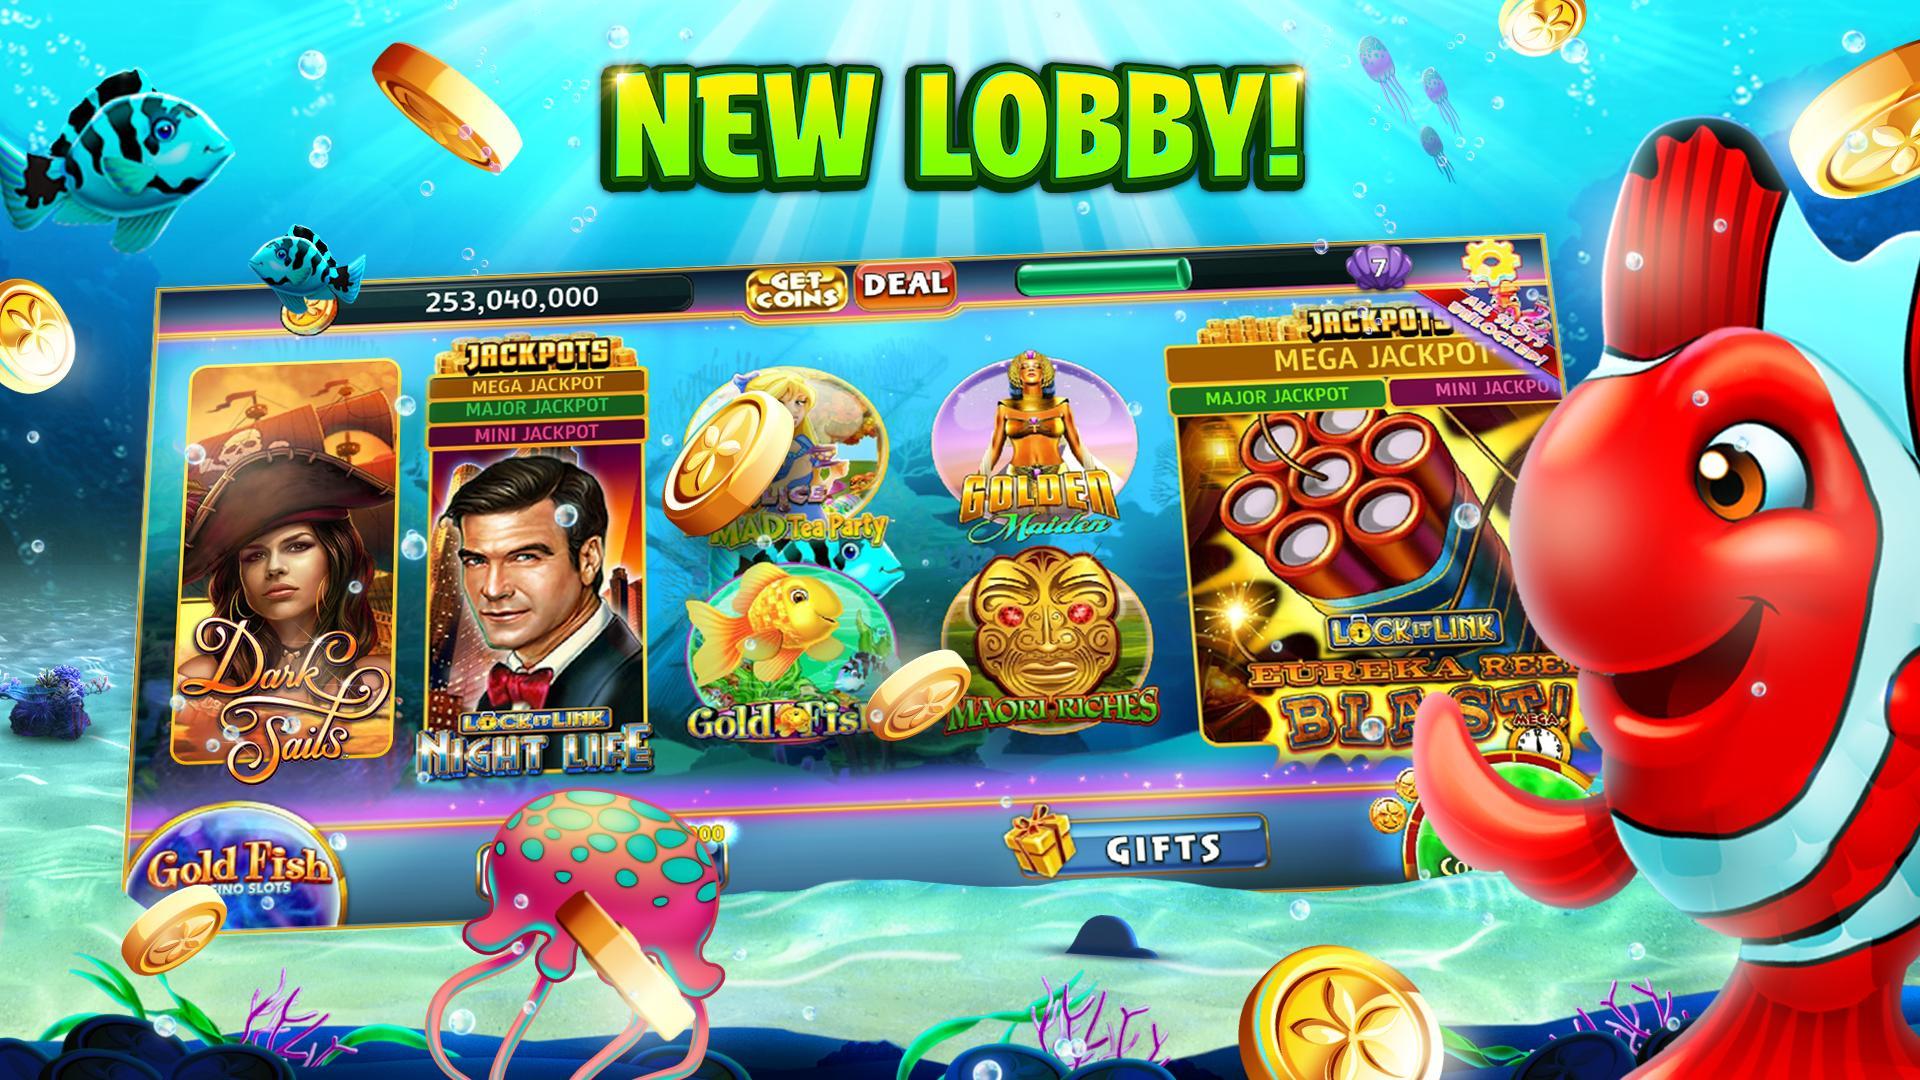 Gold Fish Casino Slots - FREE Slot Machine Games 25.09.00 Screenshot 2